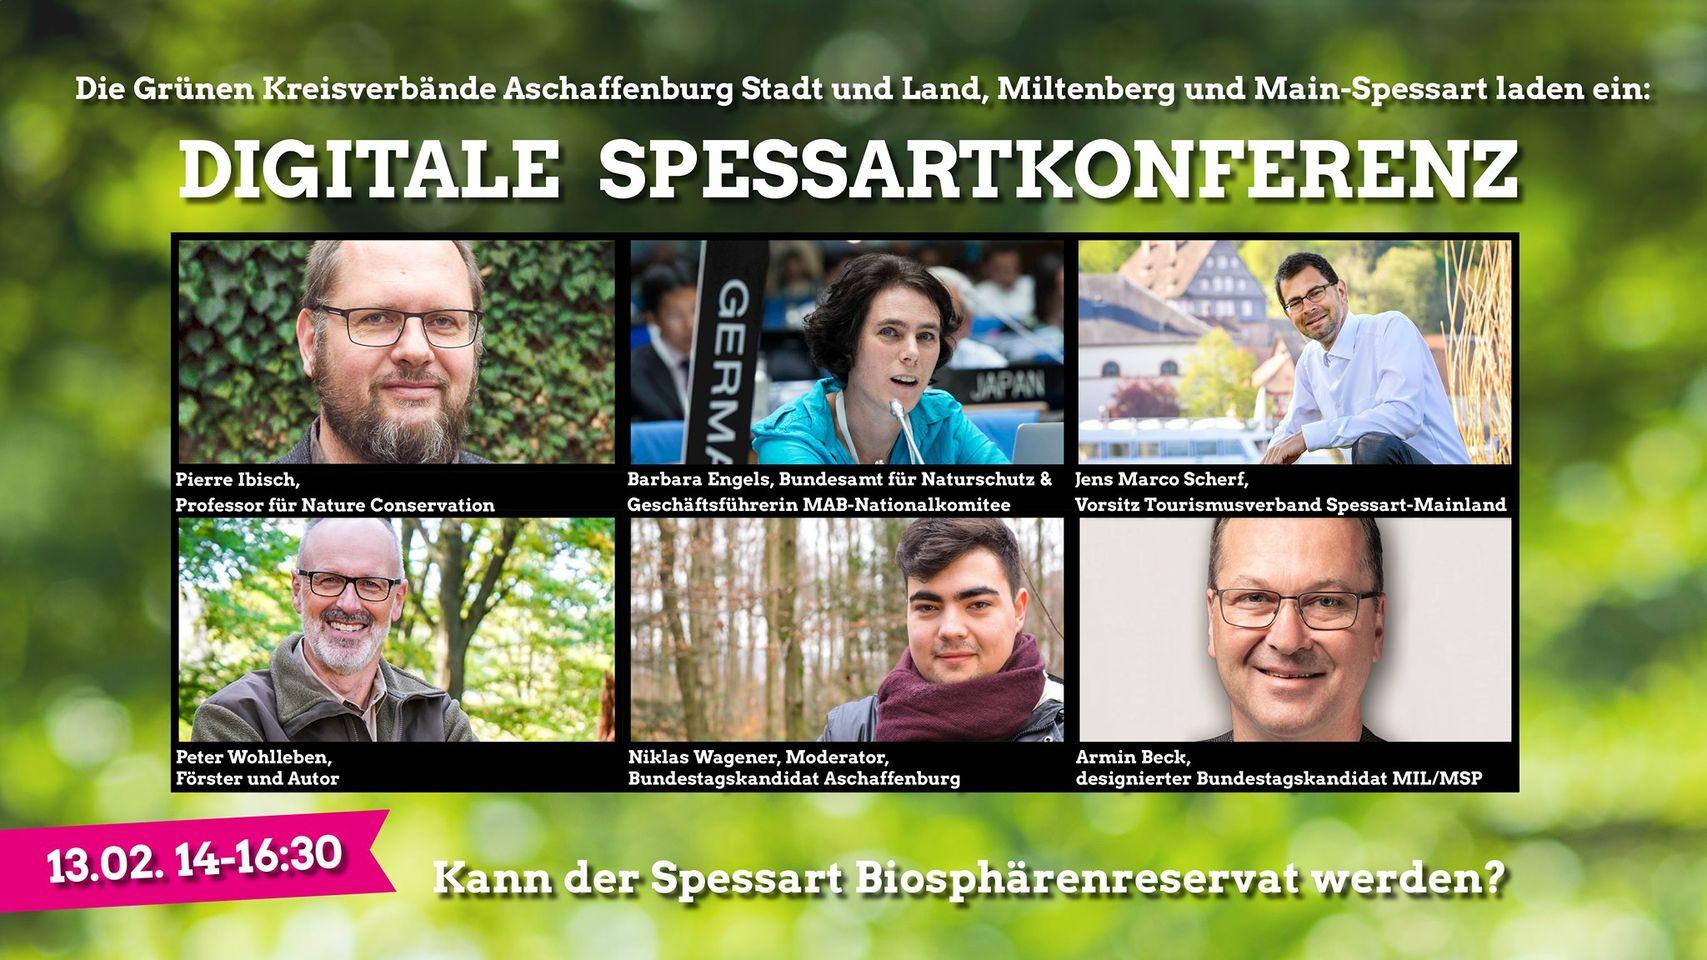 Digitale Spessartkonferenz